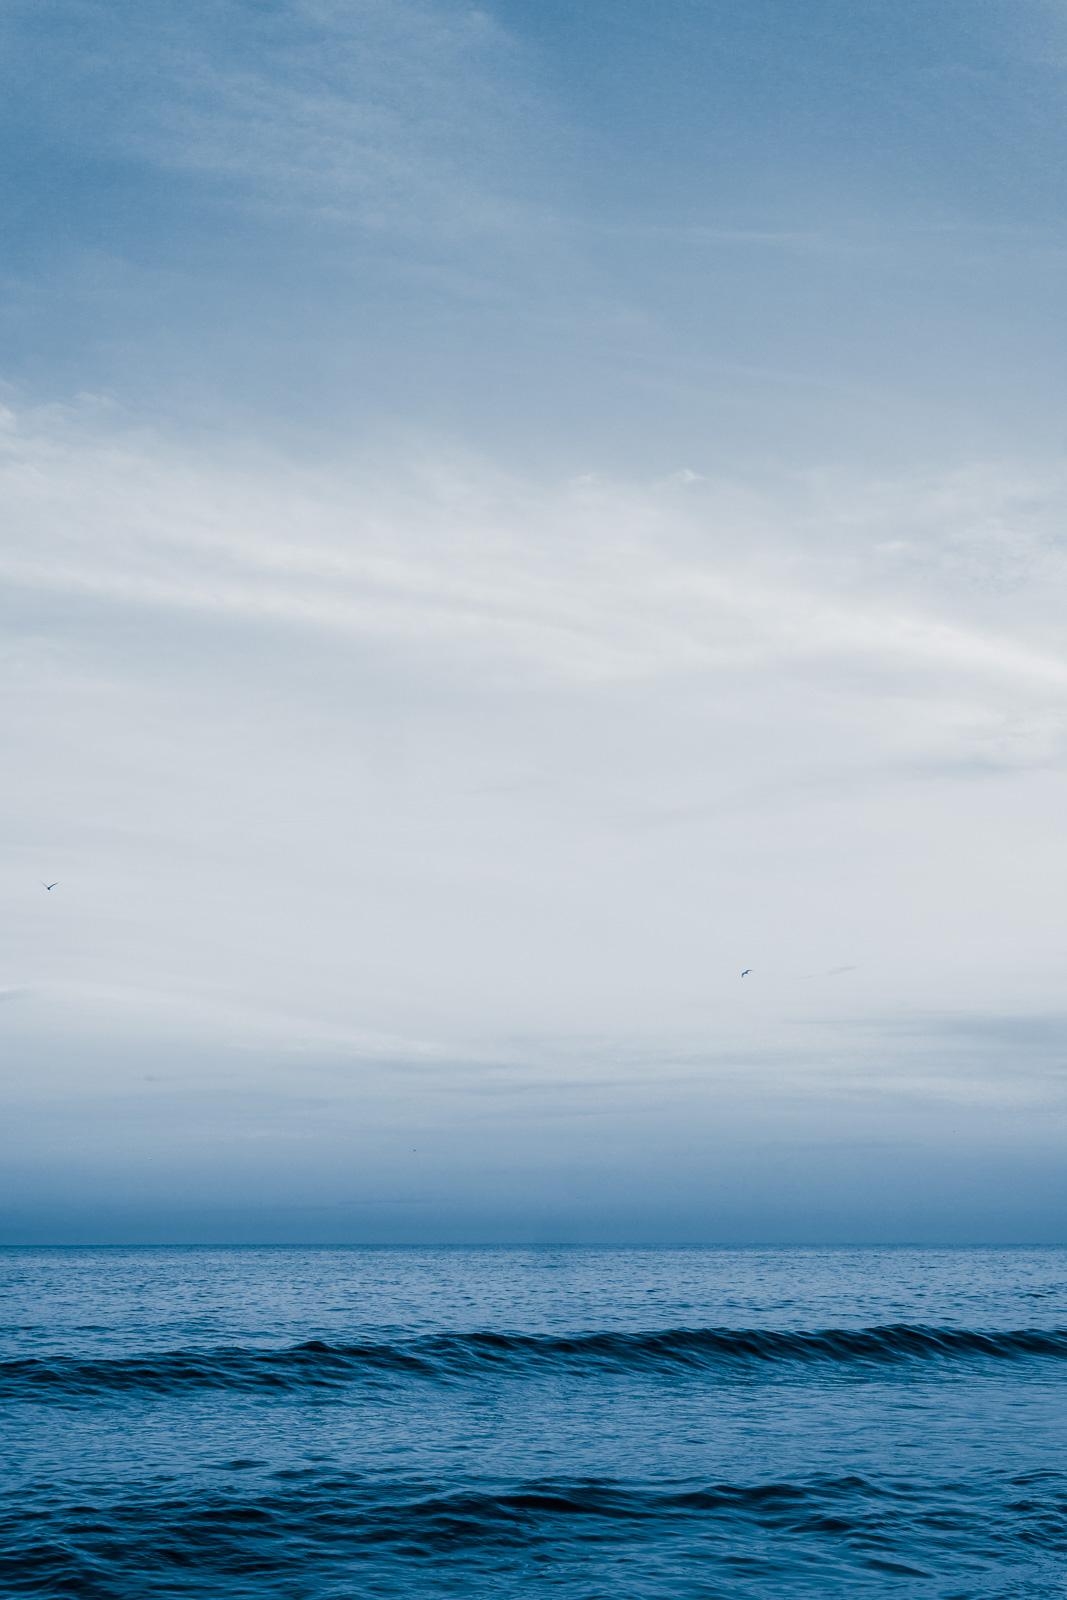 1_Newport-Beach-wave-art_Joseph-Barber-Photography.jpg